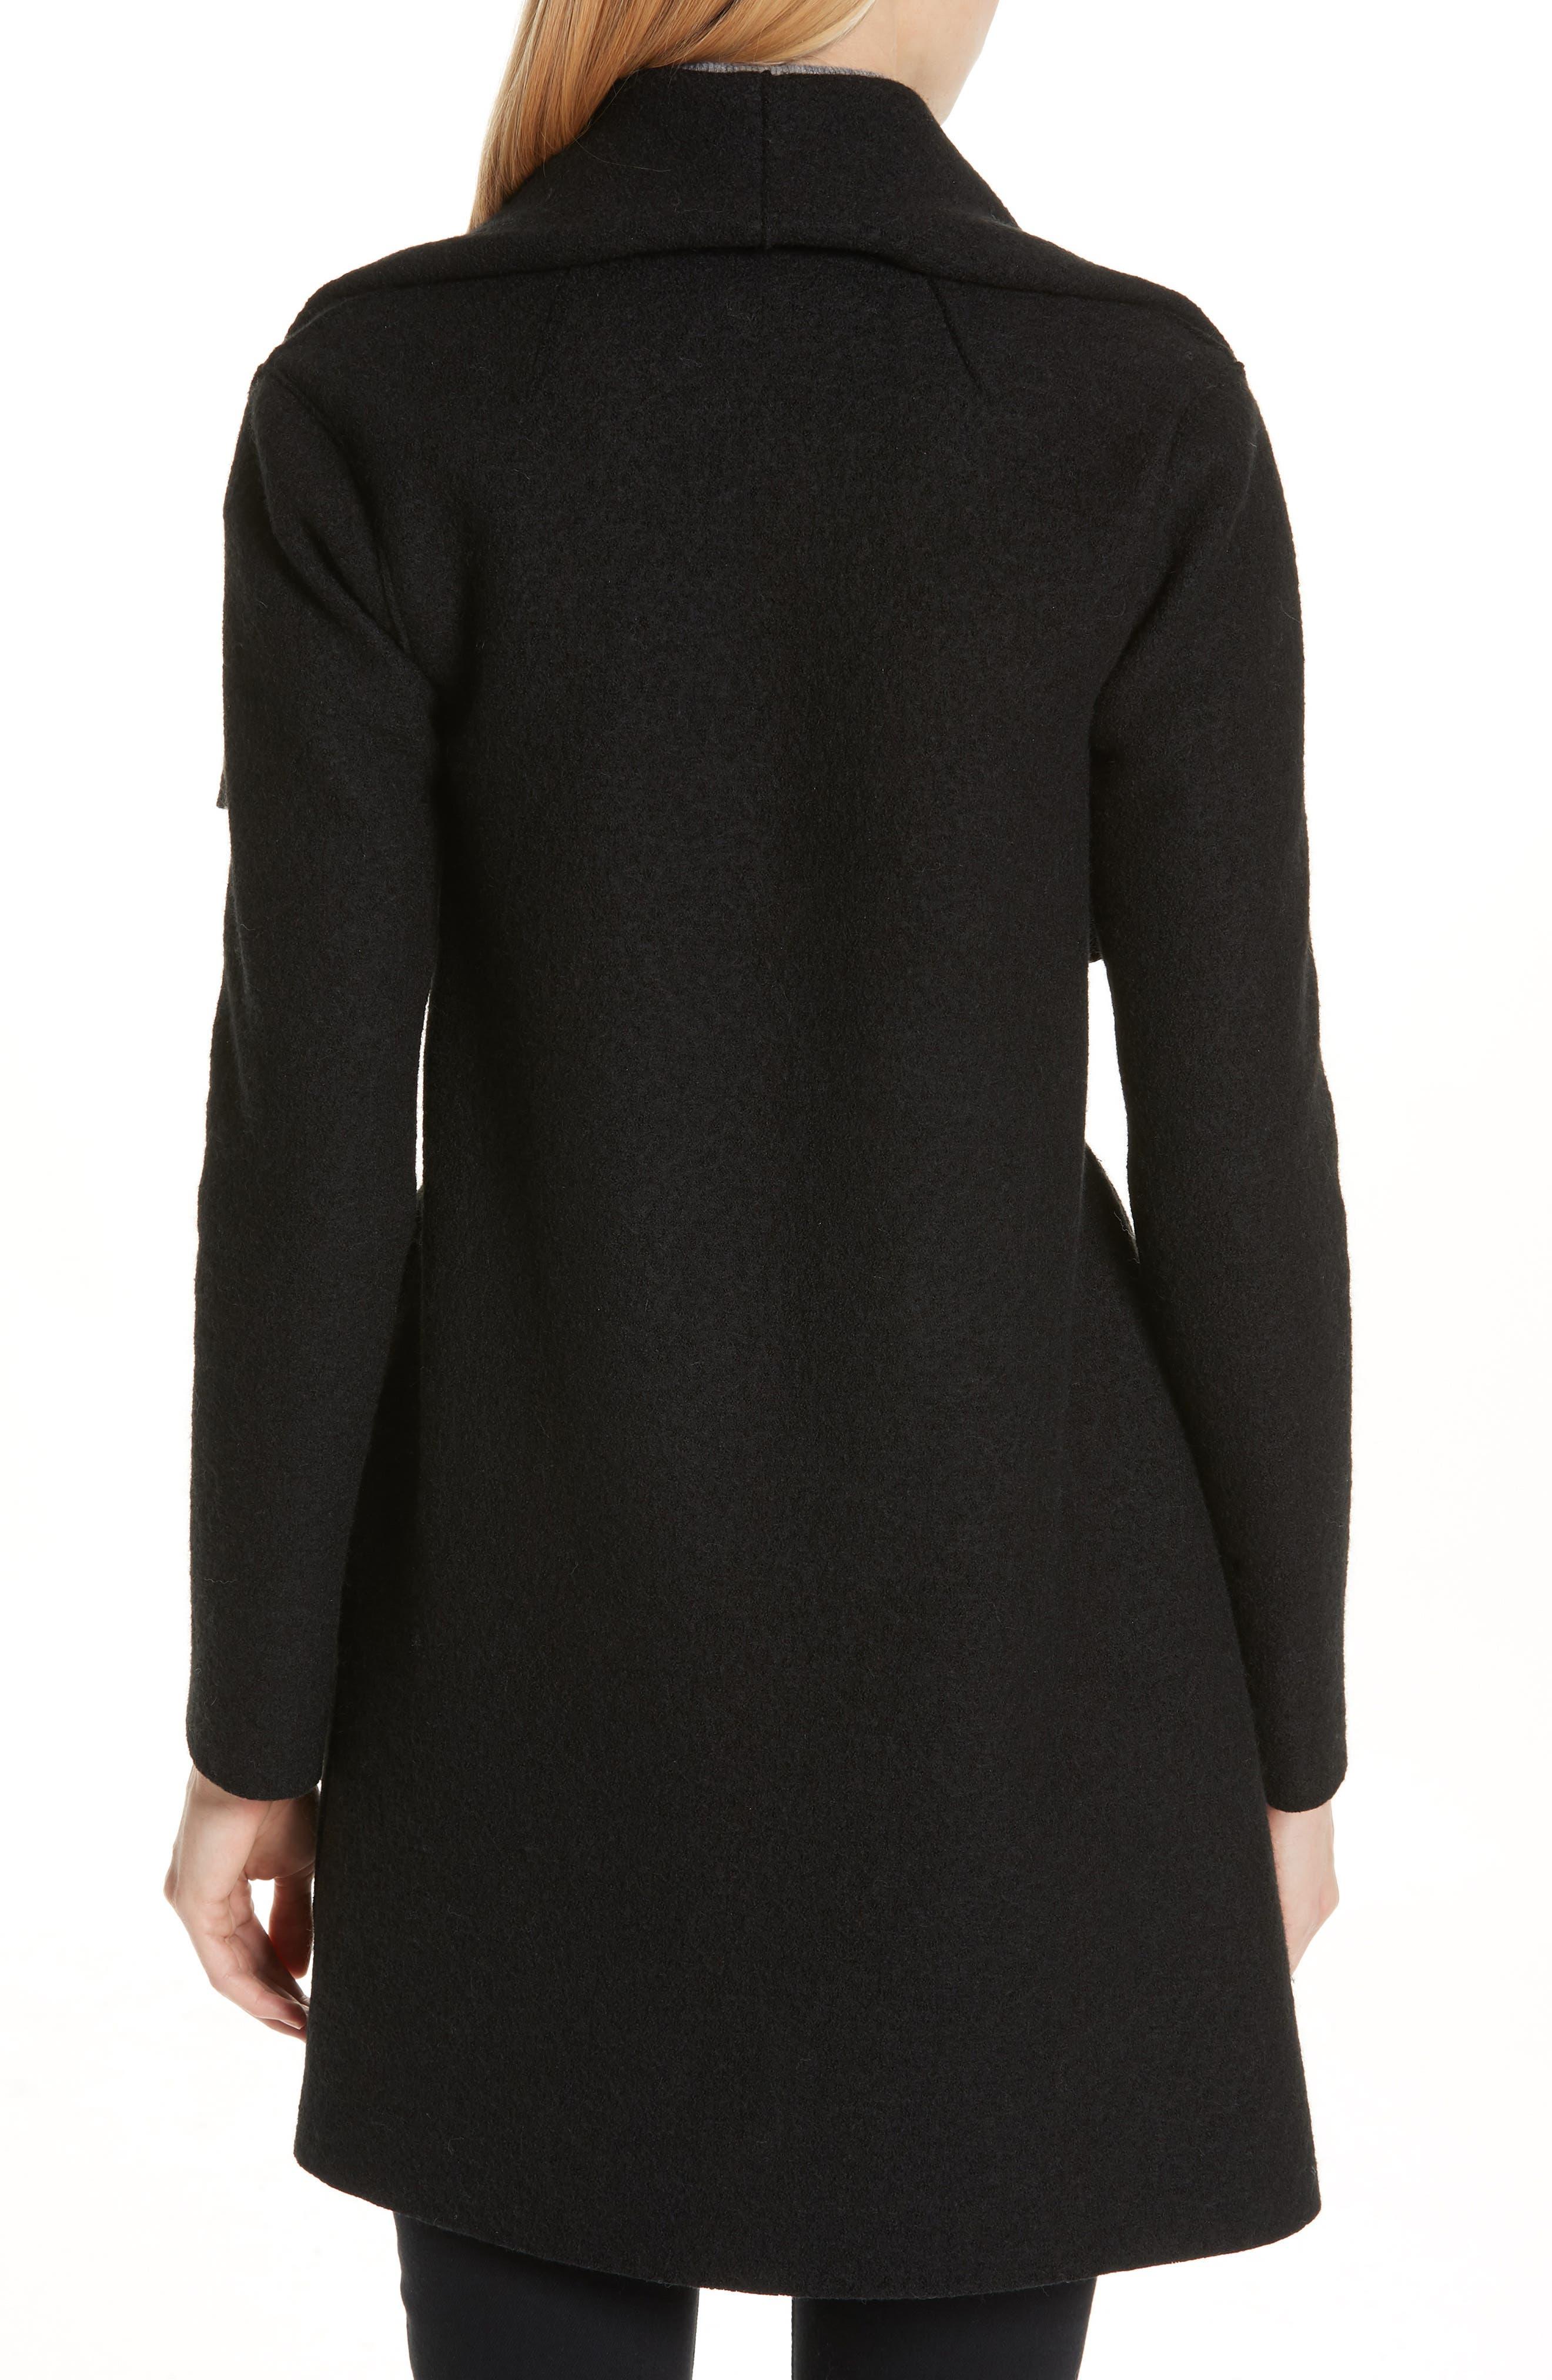 HARRIS WHARF LONDON, Belted Wool Coat, Alternate thumbnail 2, color, BLACK